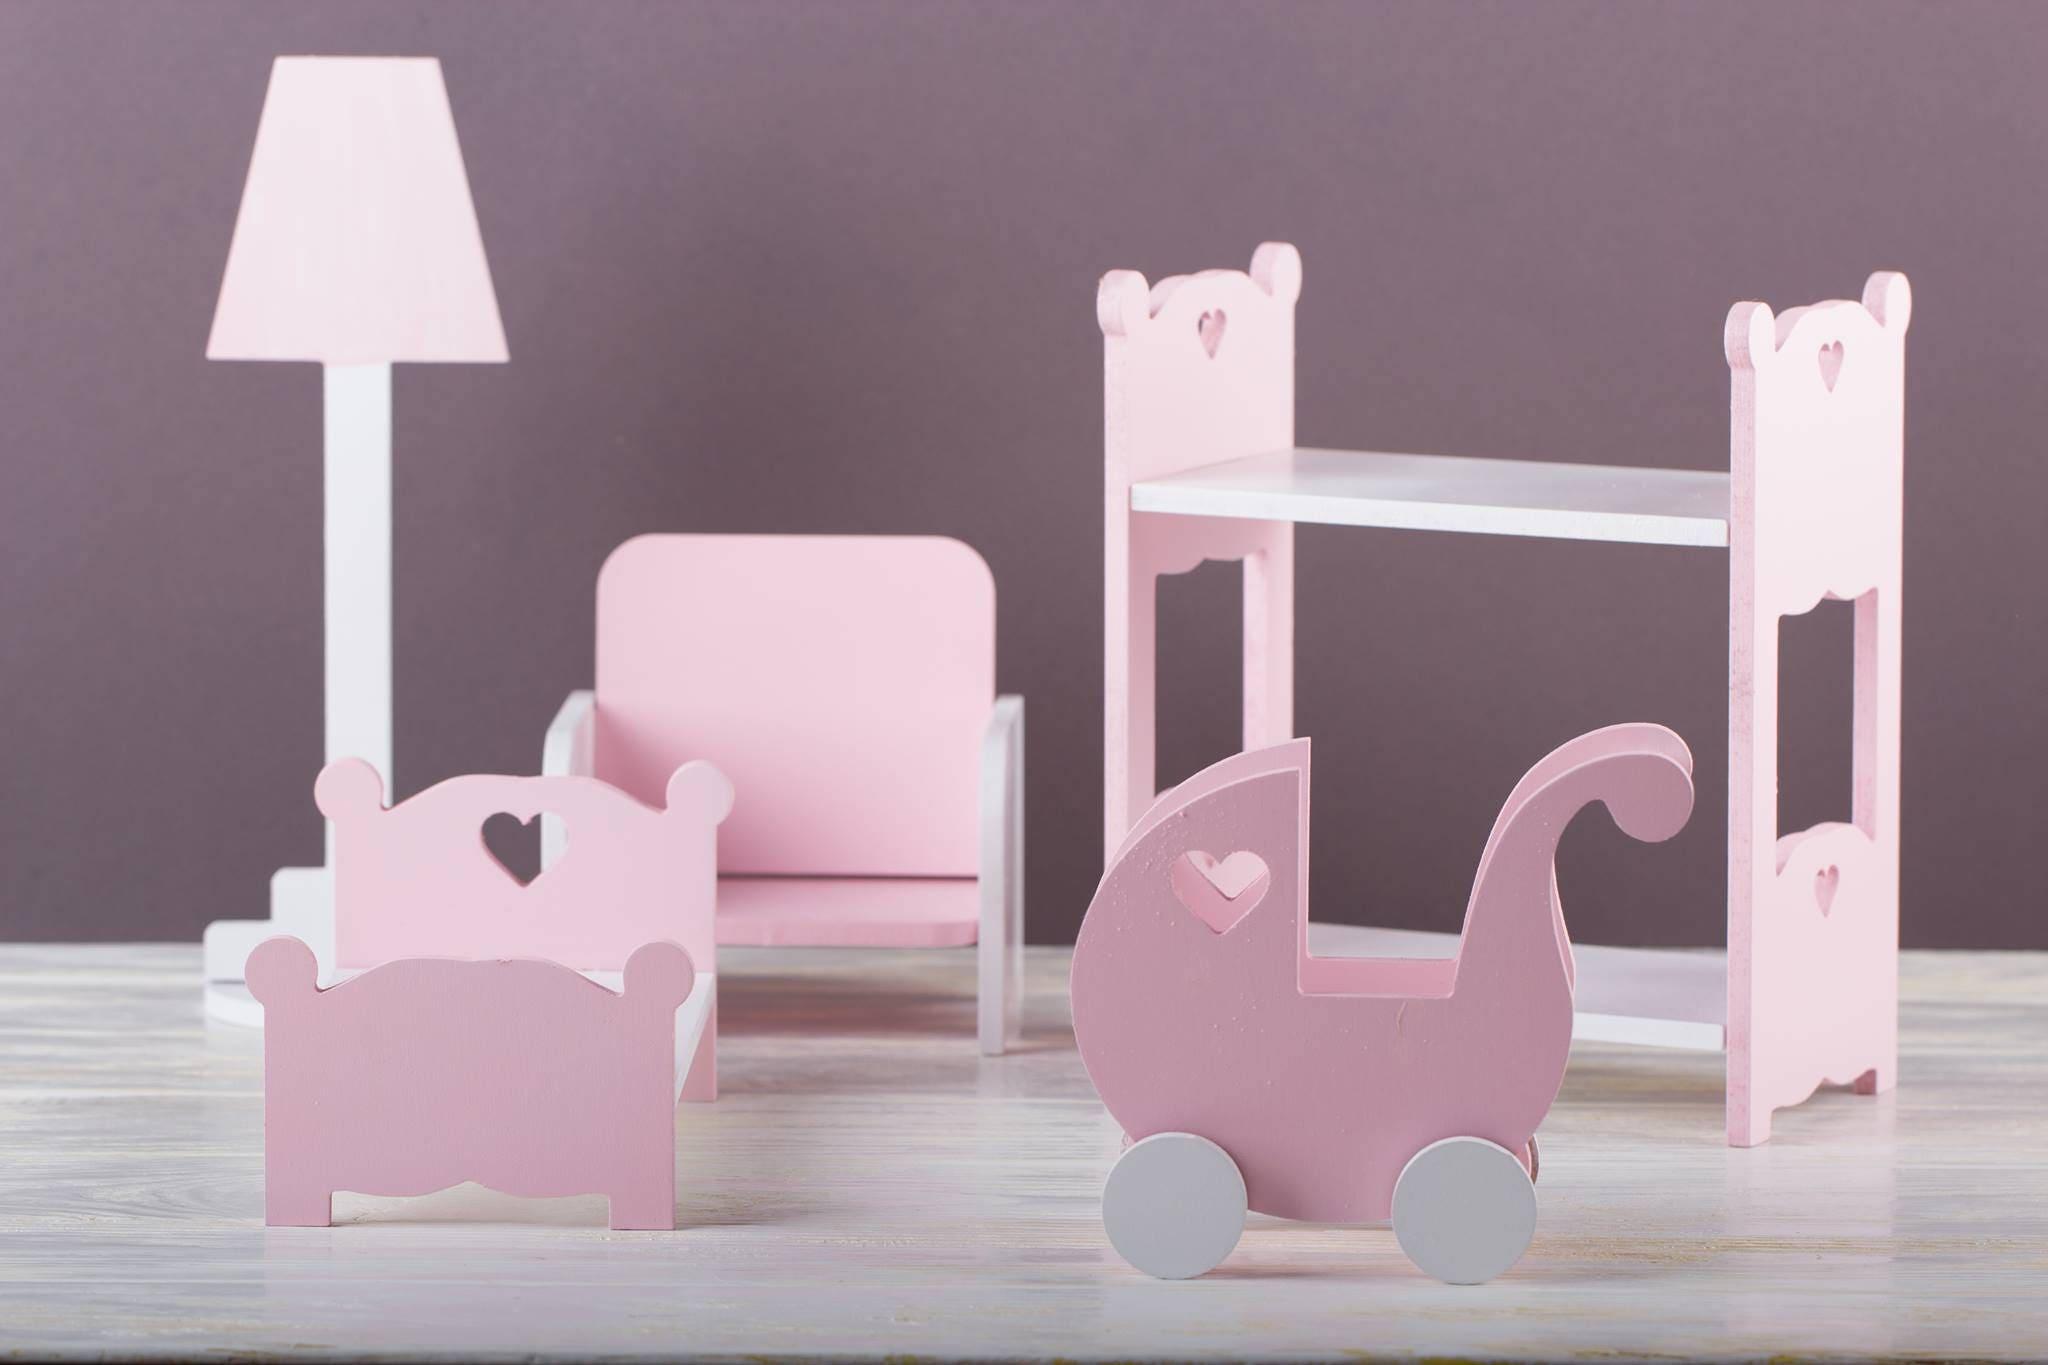 Nursery Furniture Set   Barbie Furniture   Wooden Dollhouse Furniture    Nursery Decor   Eco Toys